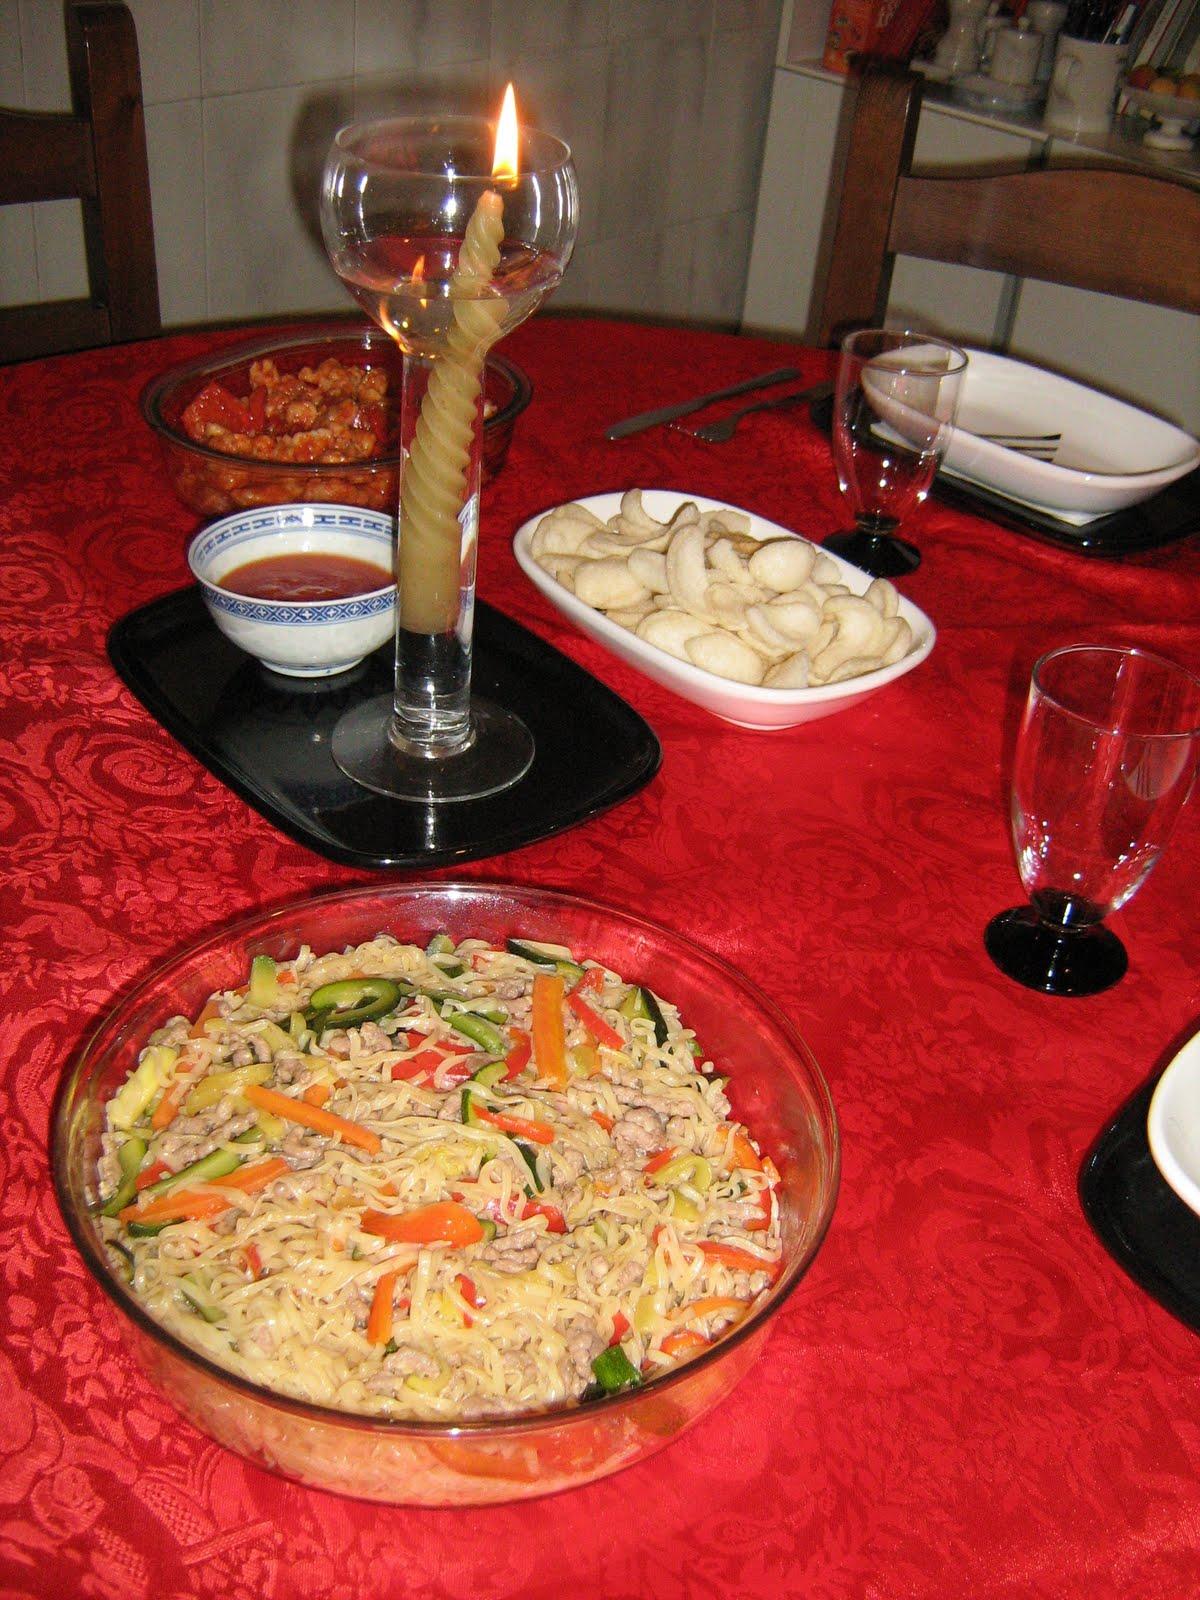 La cucina di lilla men cinese for Menu cinese ricette